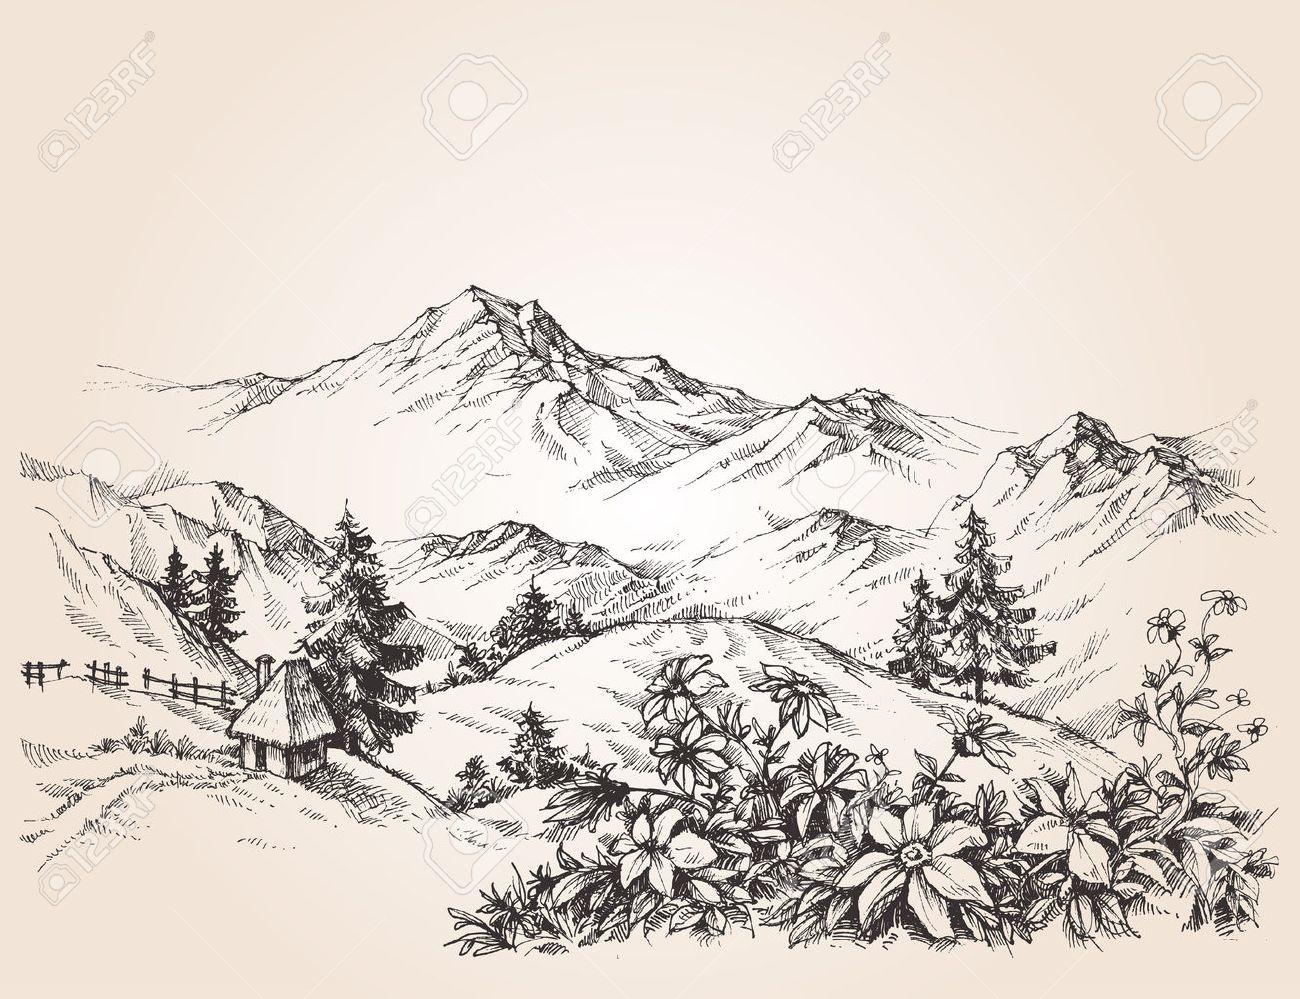 Mountains landscape sketch - 51327199